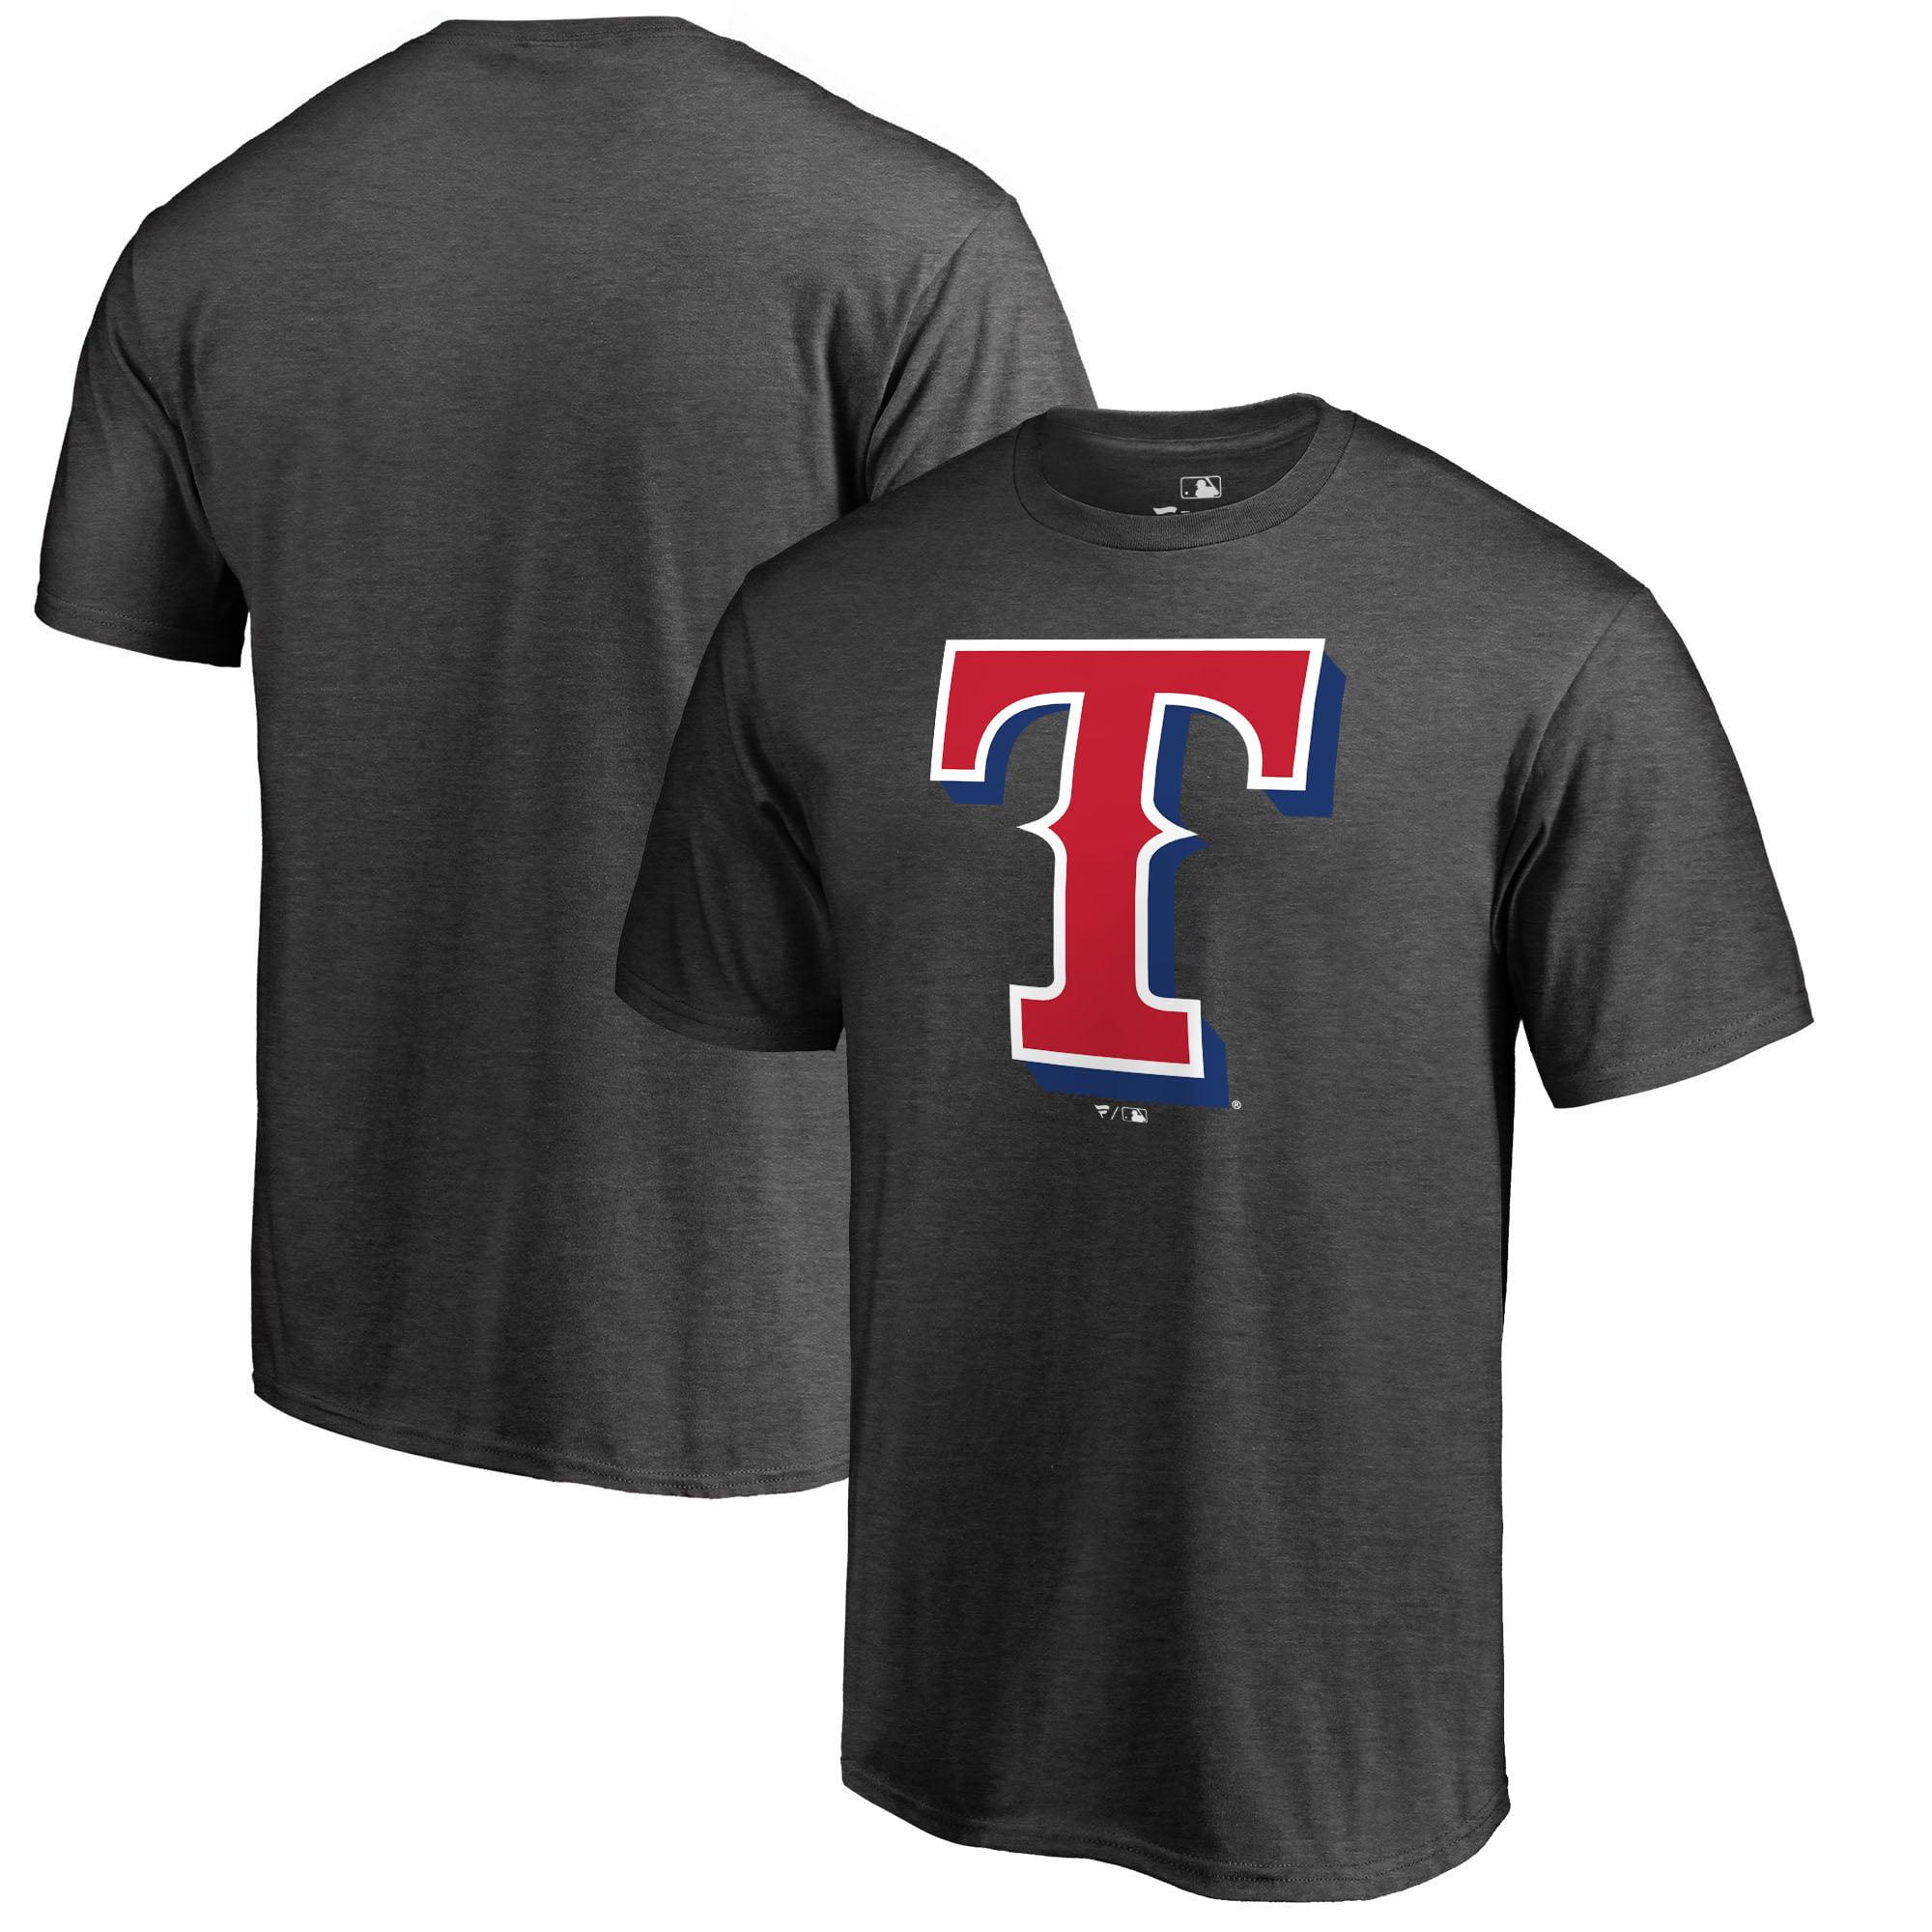 Texas Rangers Fanatics Branded Big & Tall Primary Logo T-Shirt - Heathered Charcoal